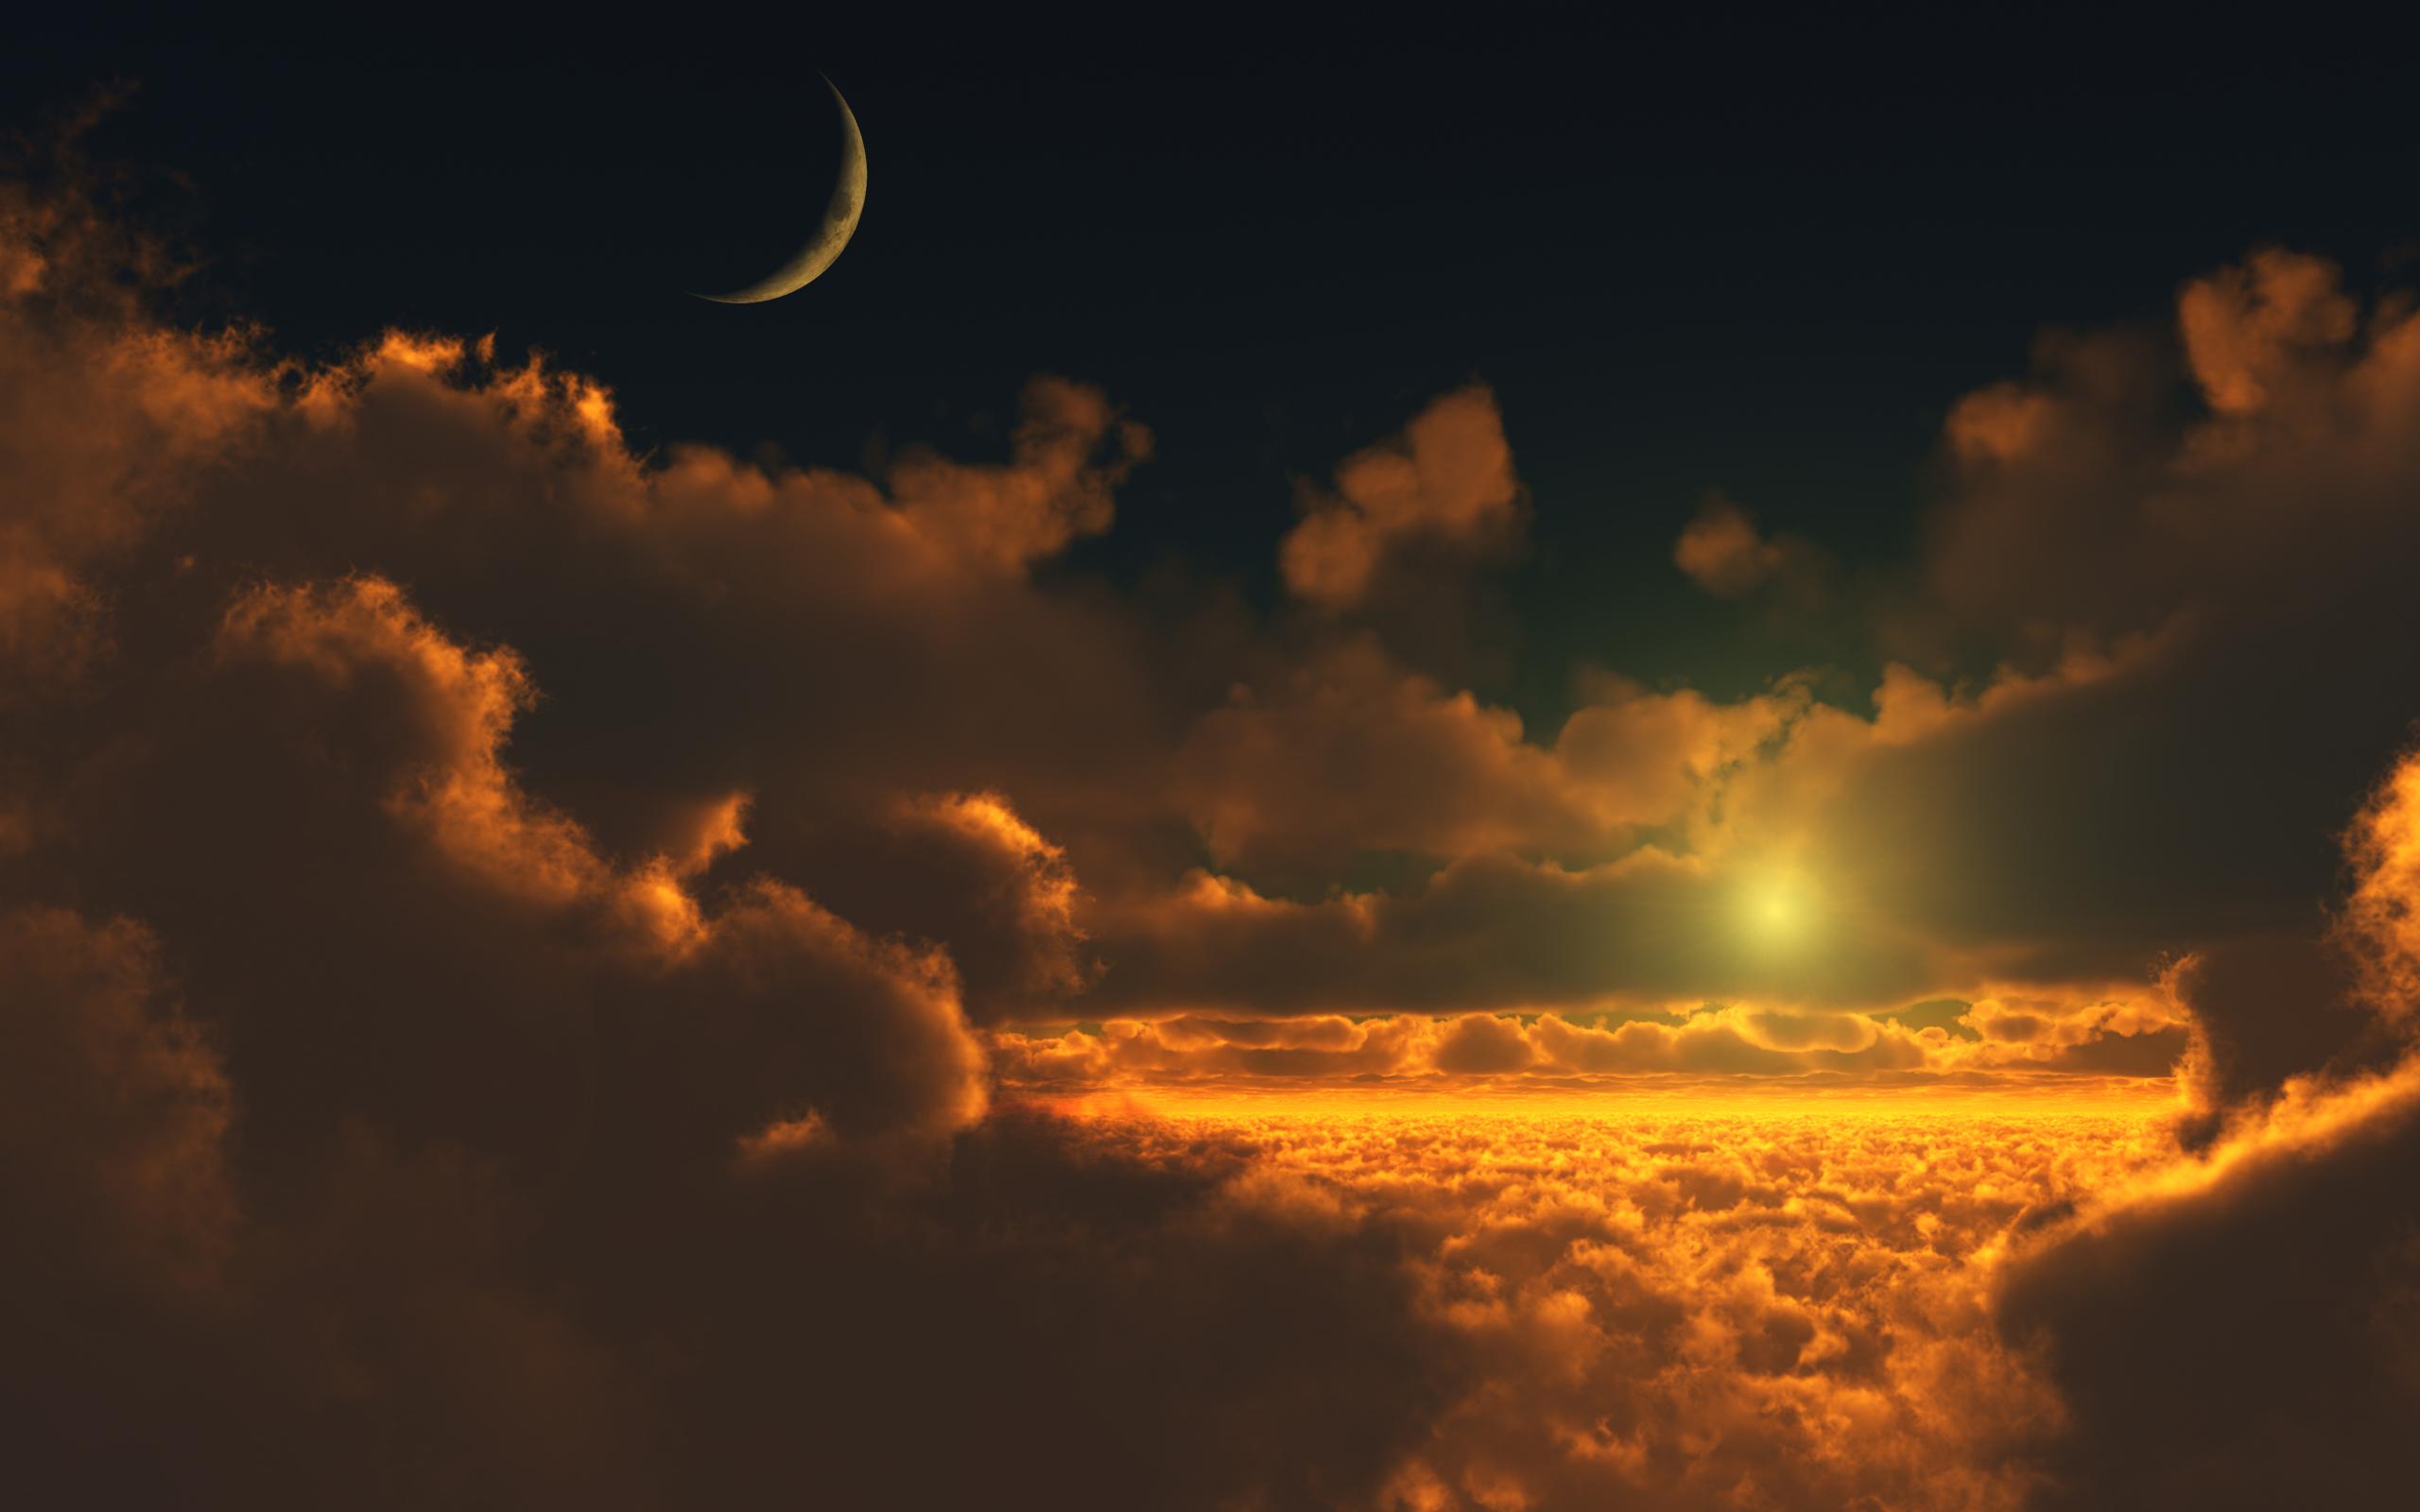 Technology Abstract Golden Cloudscape Iphone Ipad Mac At Slidetostyle 1248711 Wallpaper wallpaper